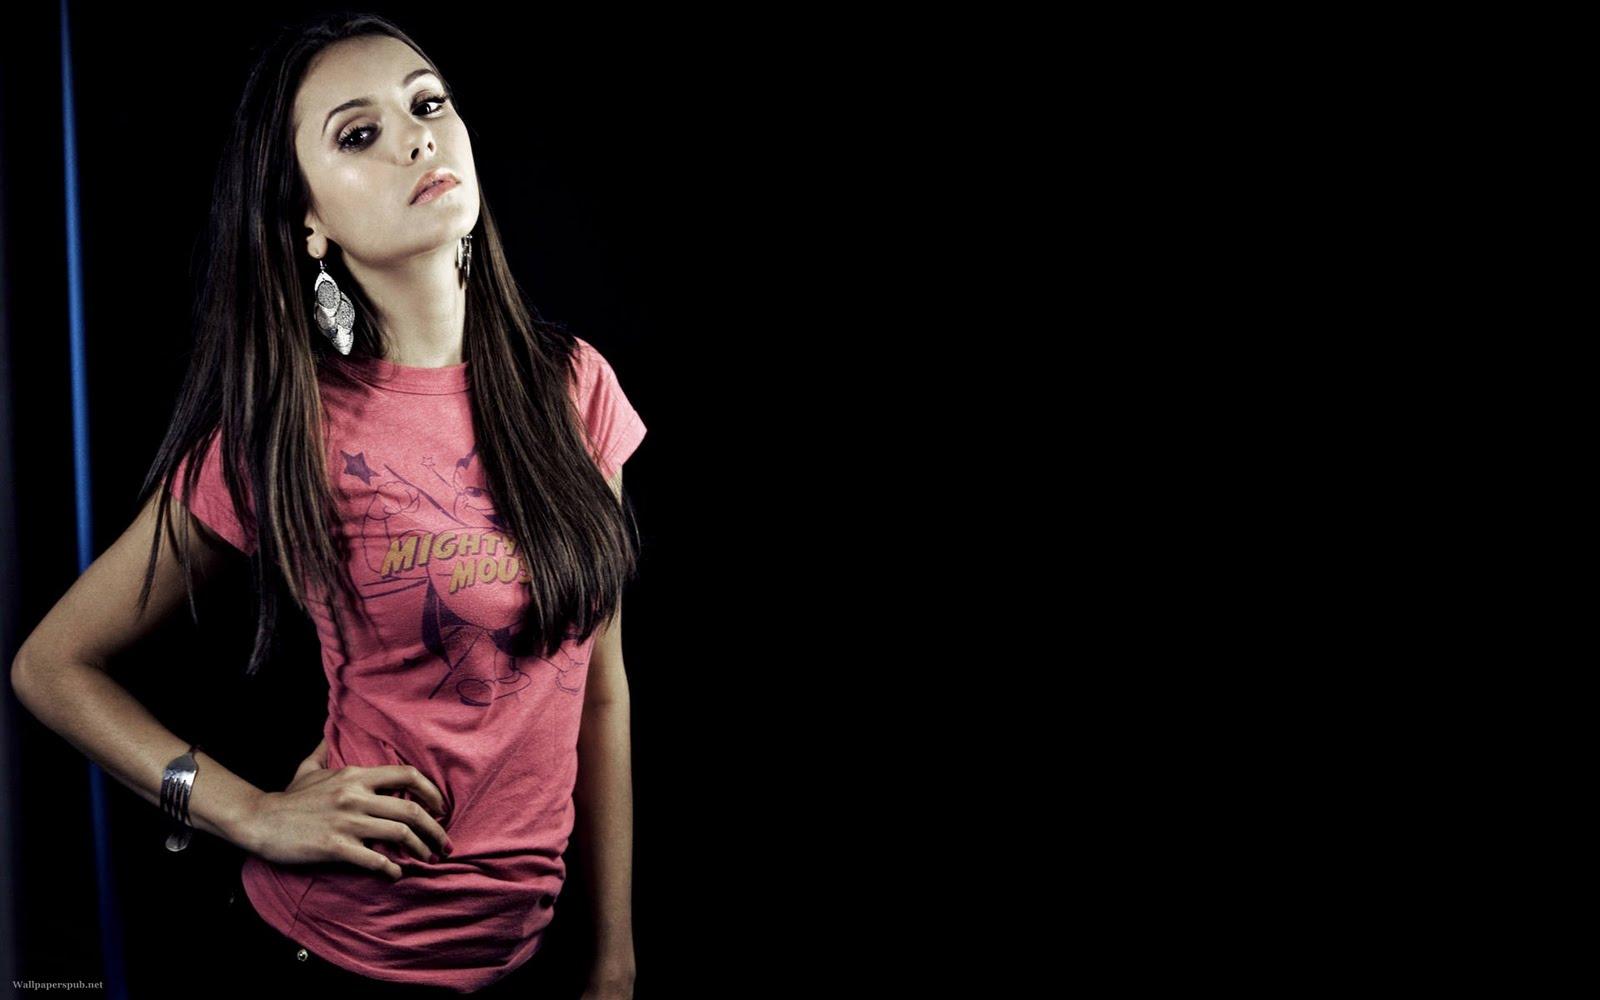 http://2.bp.blogspot.com/-shG2ZqKe9Kc/ThzHVhMe_FI/AAAAAAAACu4/yYIYLCeQvvY/s1600/Nina+Dobrev+%252811%2529.jpg